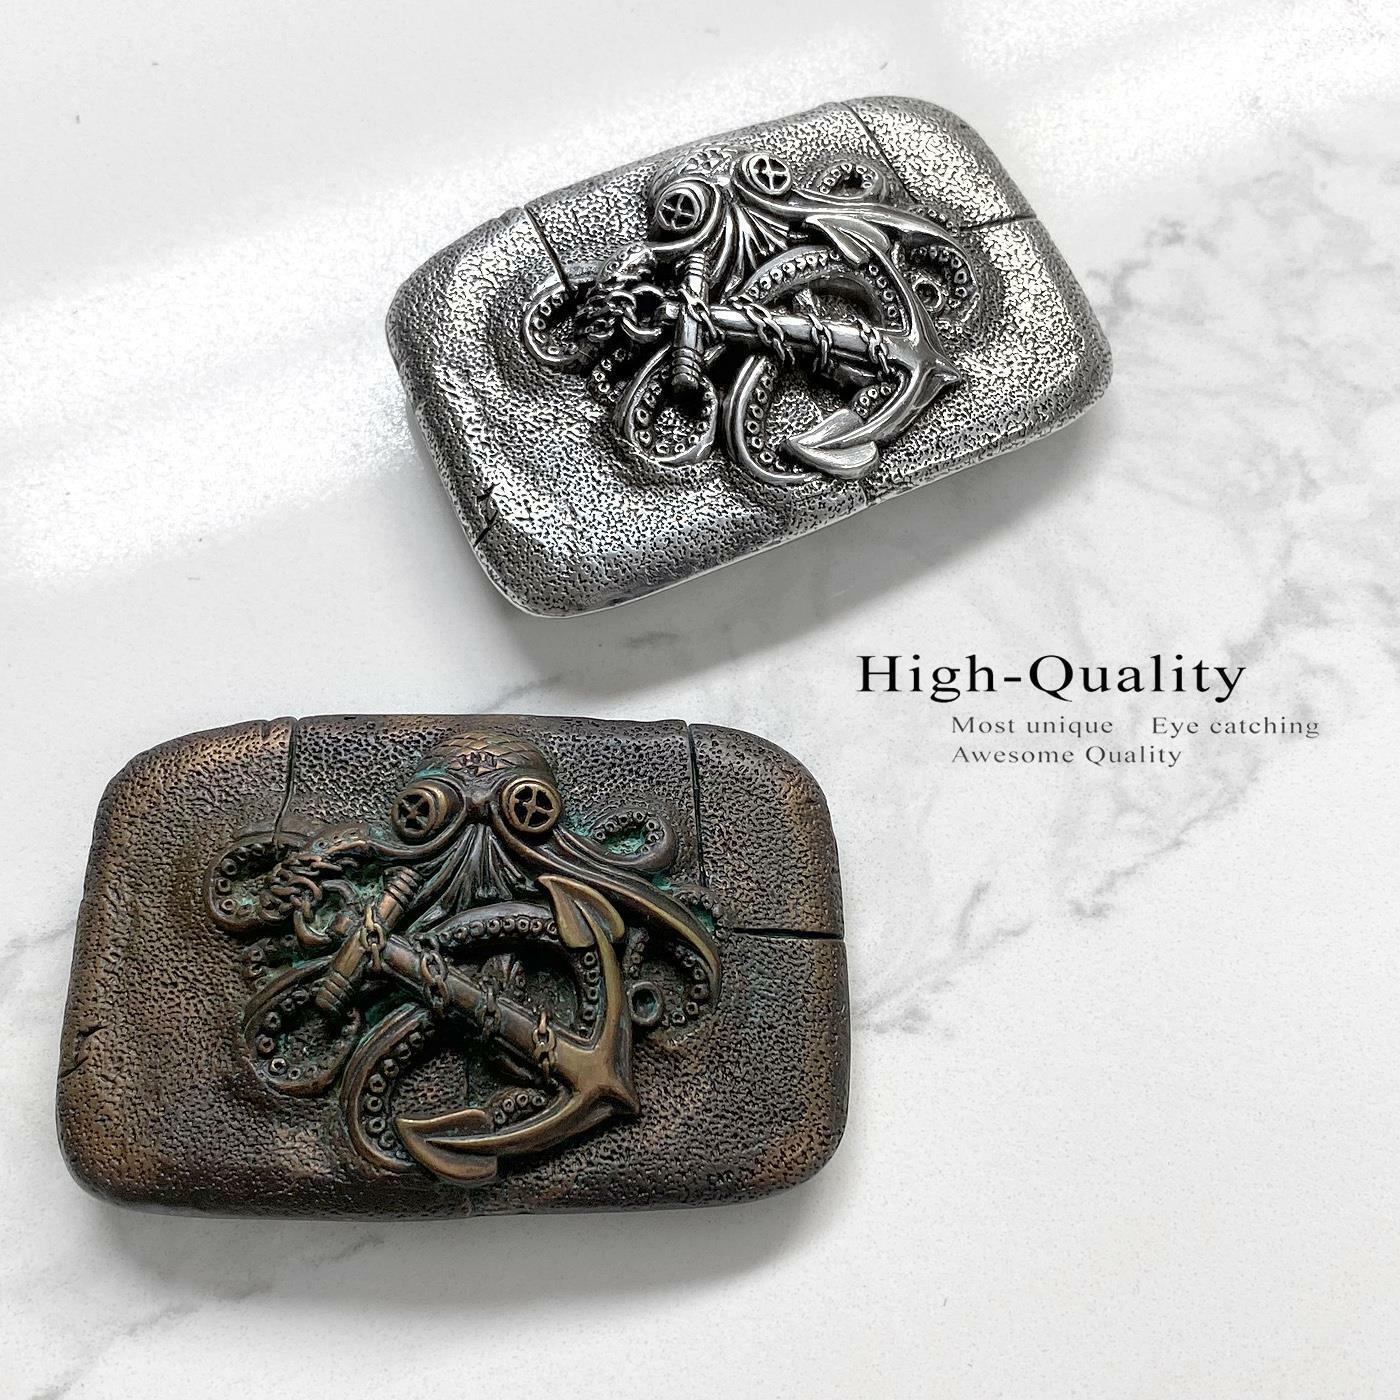 Antique Engraved Octopus Boat Anchor Belt Buckle fits 1-1/2